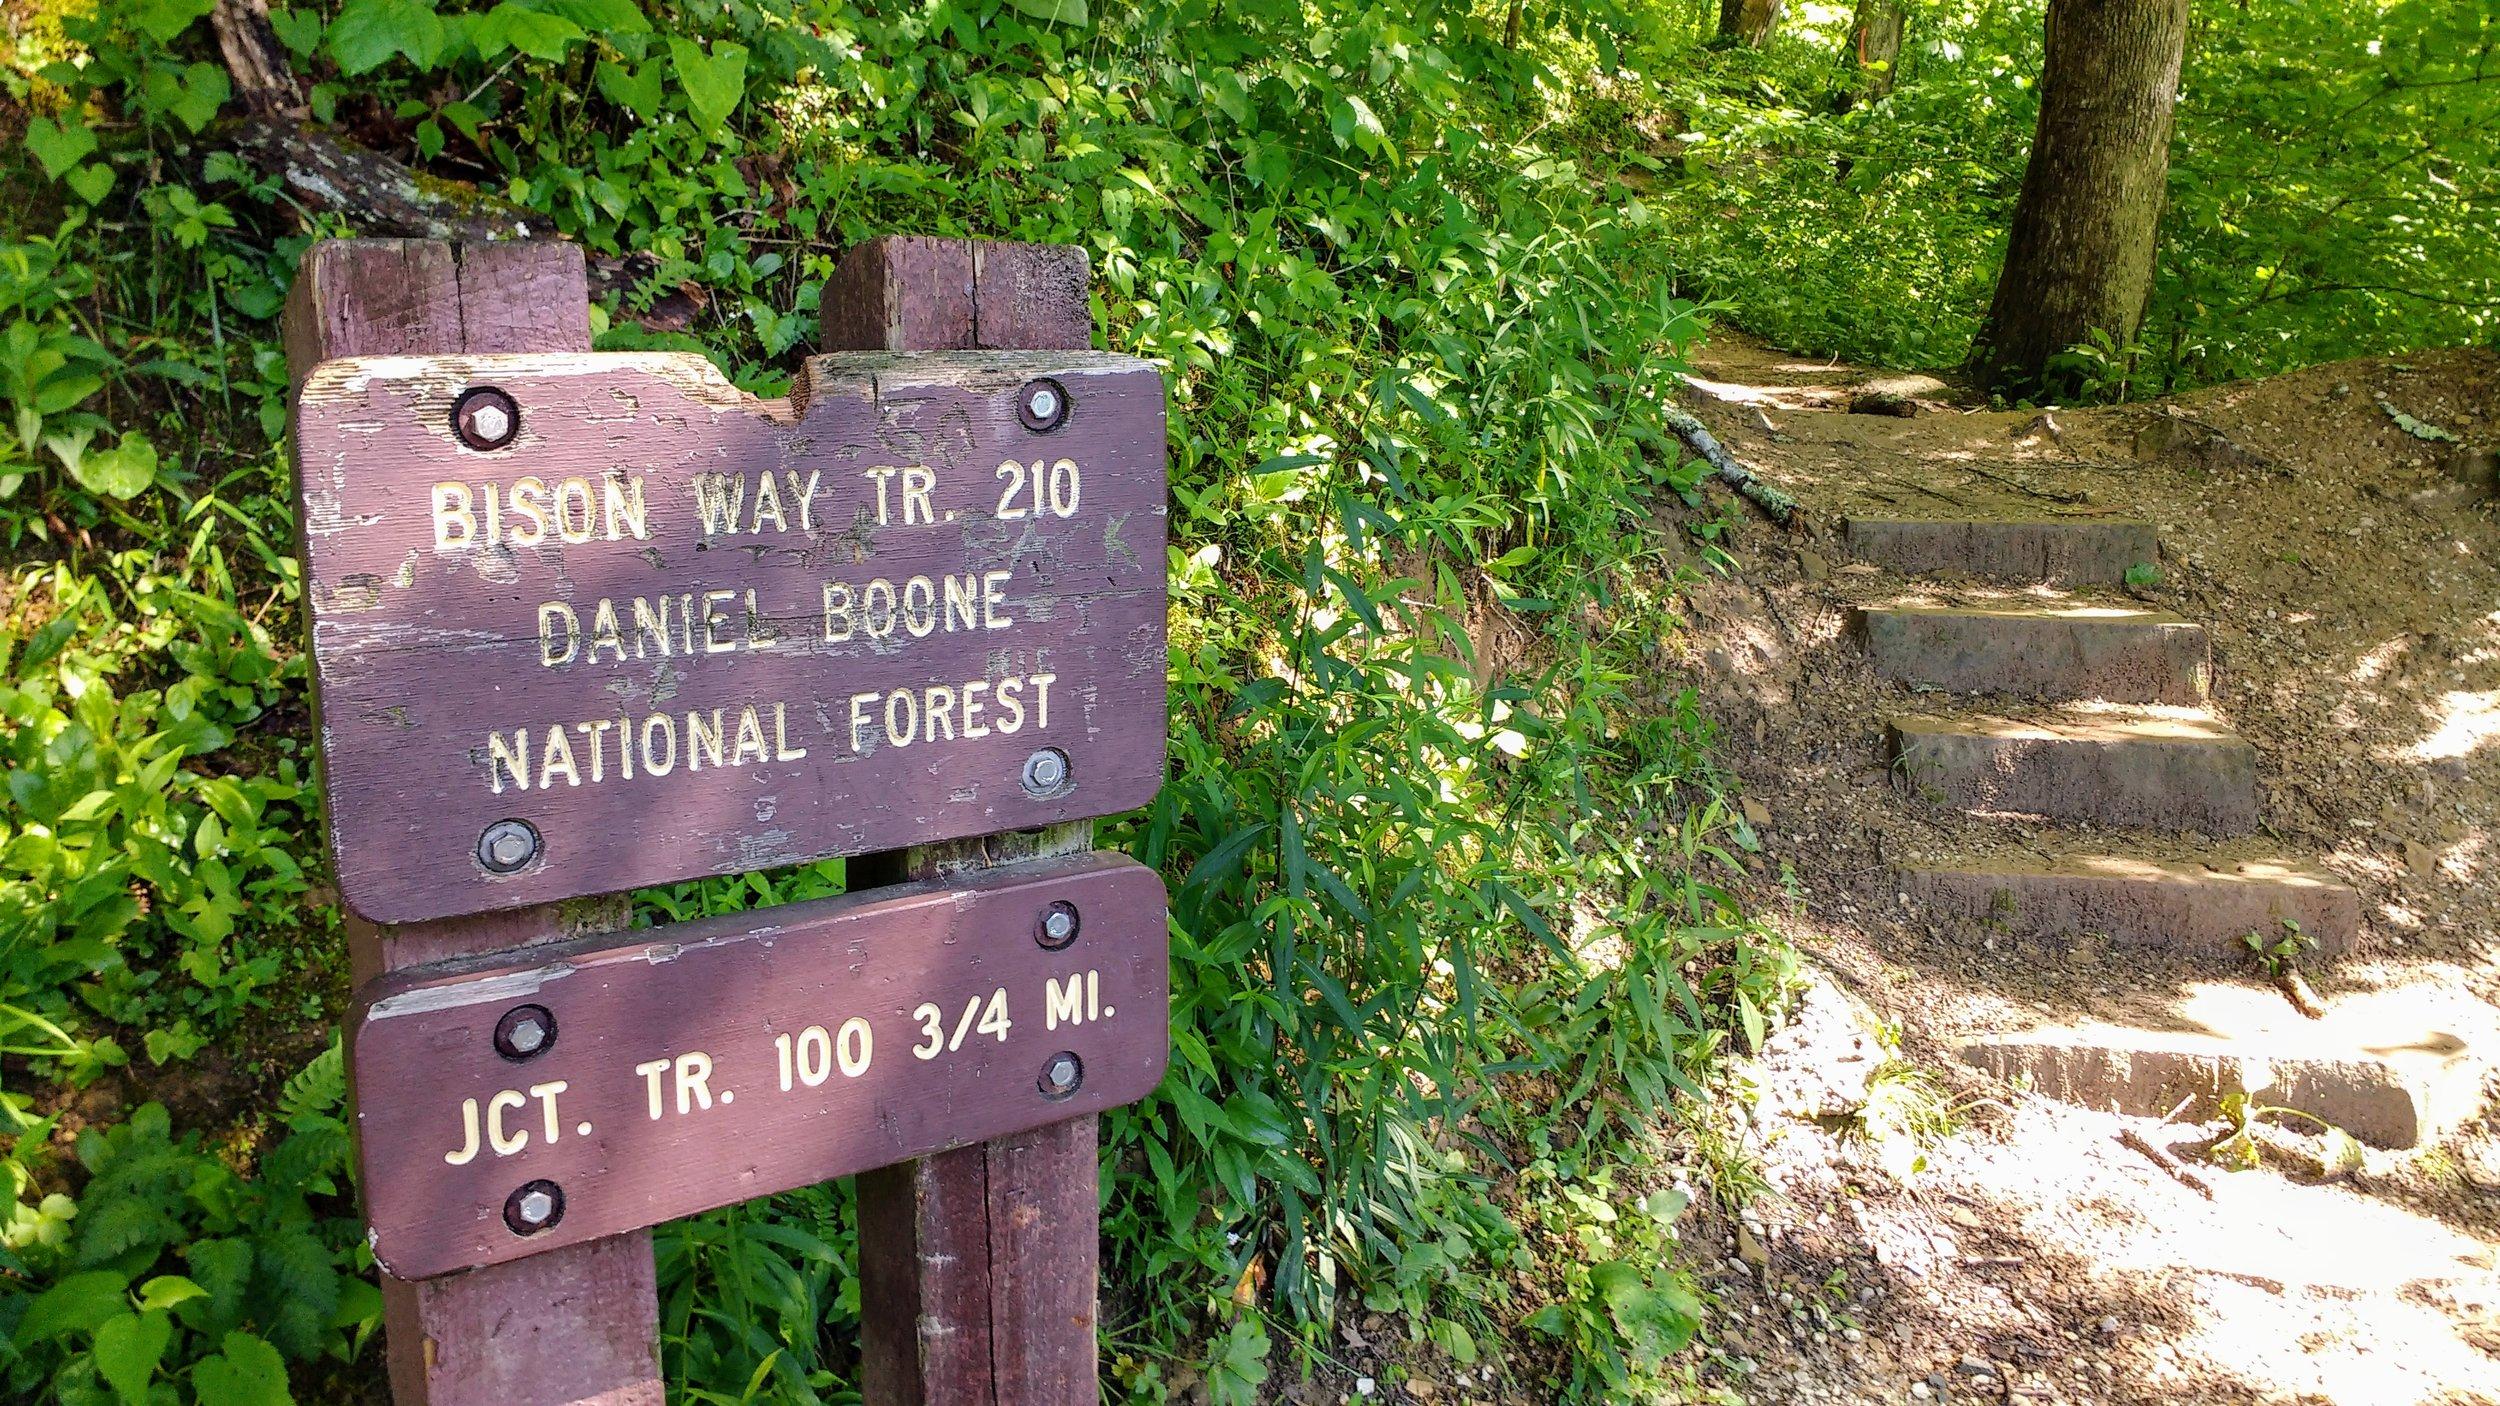 Bison Way Trail sign